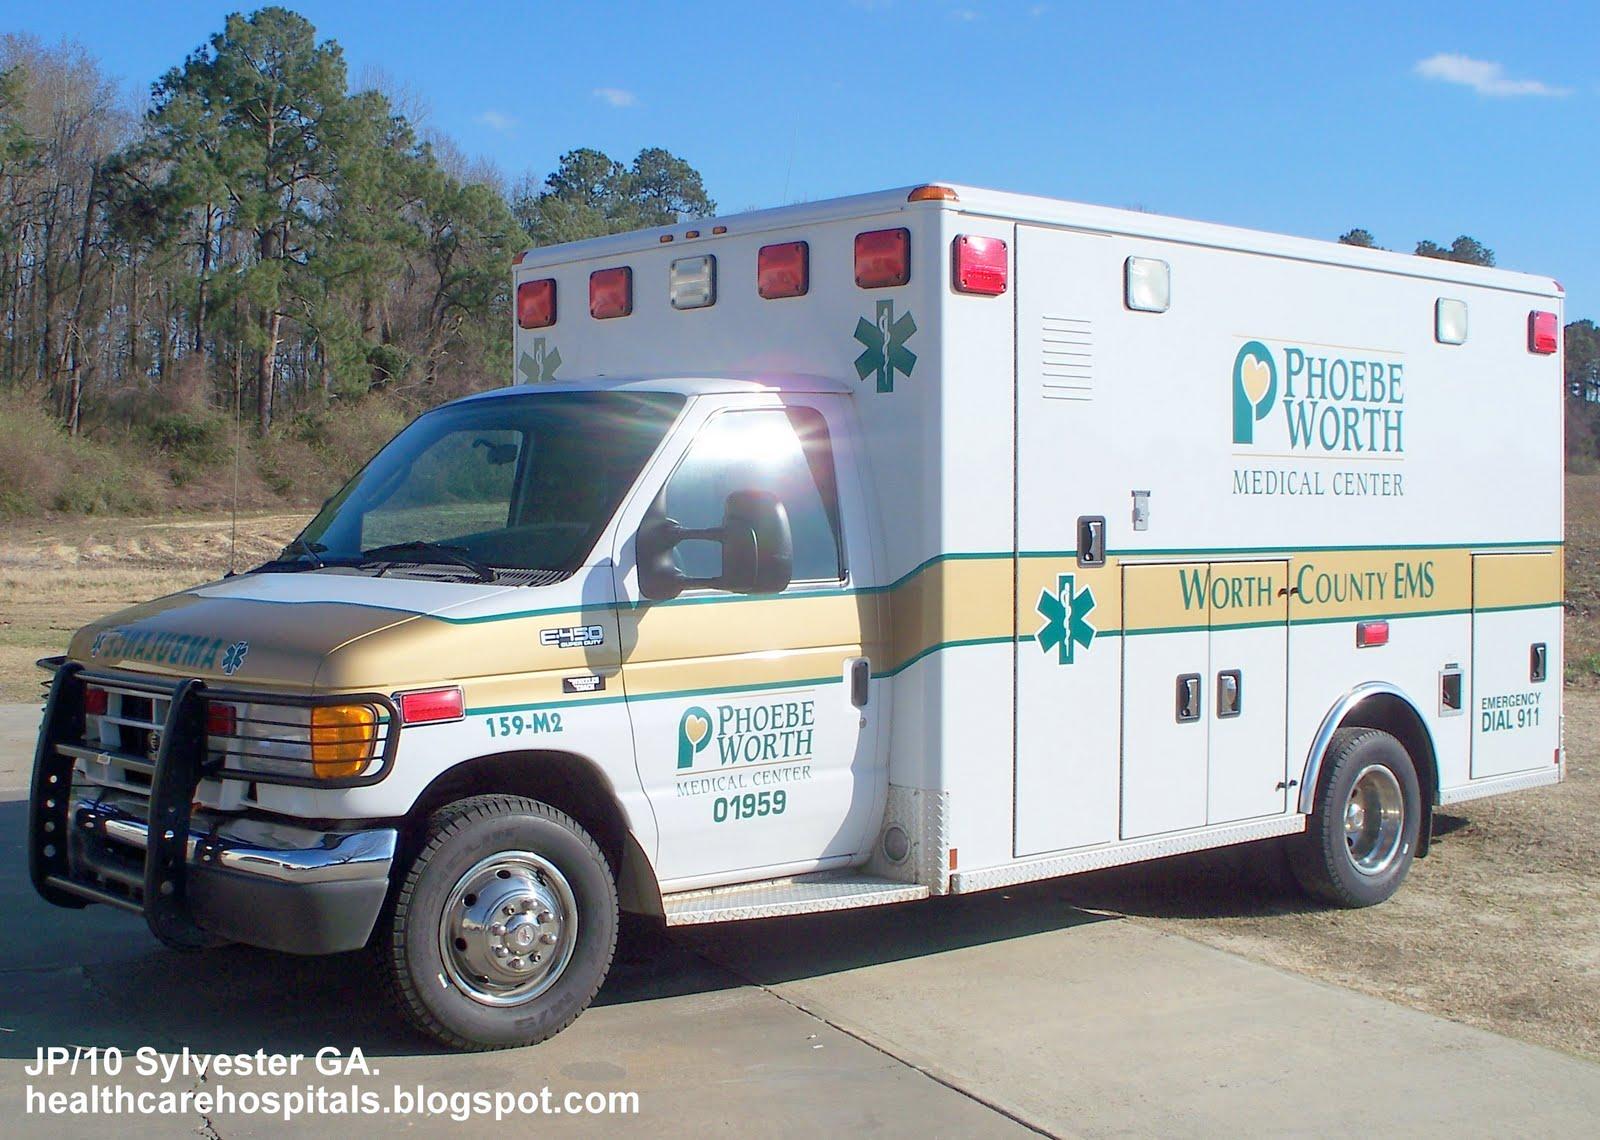 phoebe worth medical center hospital ems ambulance emergency phoebe worth medical center hospital ems ambulance emergency medical services sylvester worth county ga